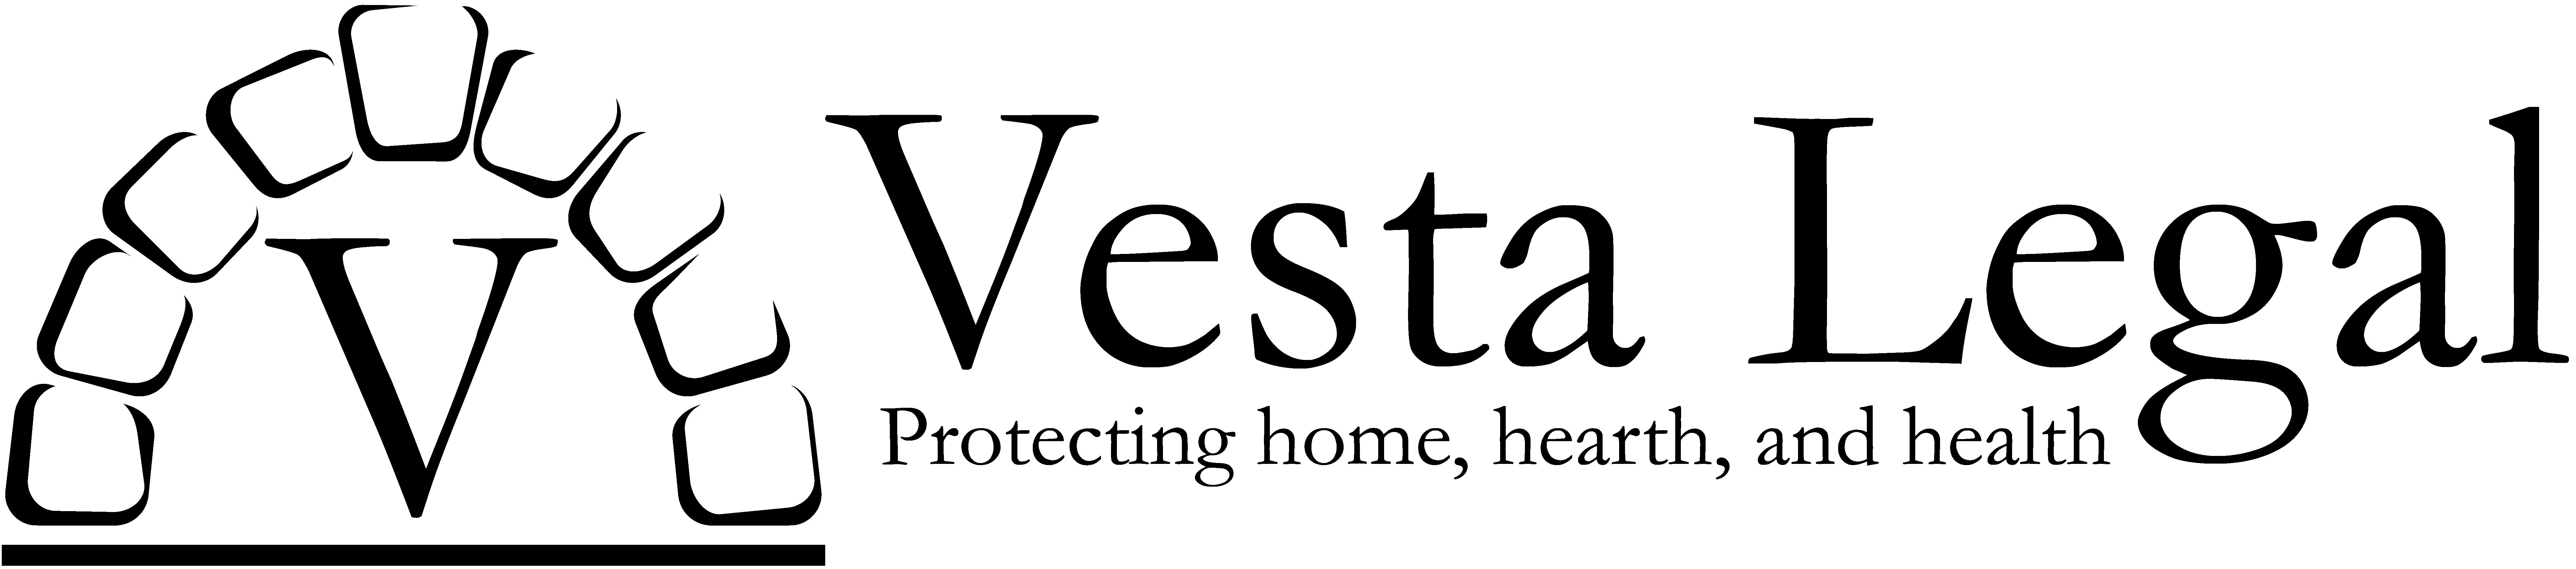 Vesta Legal